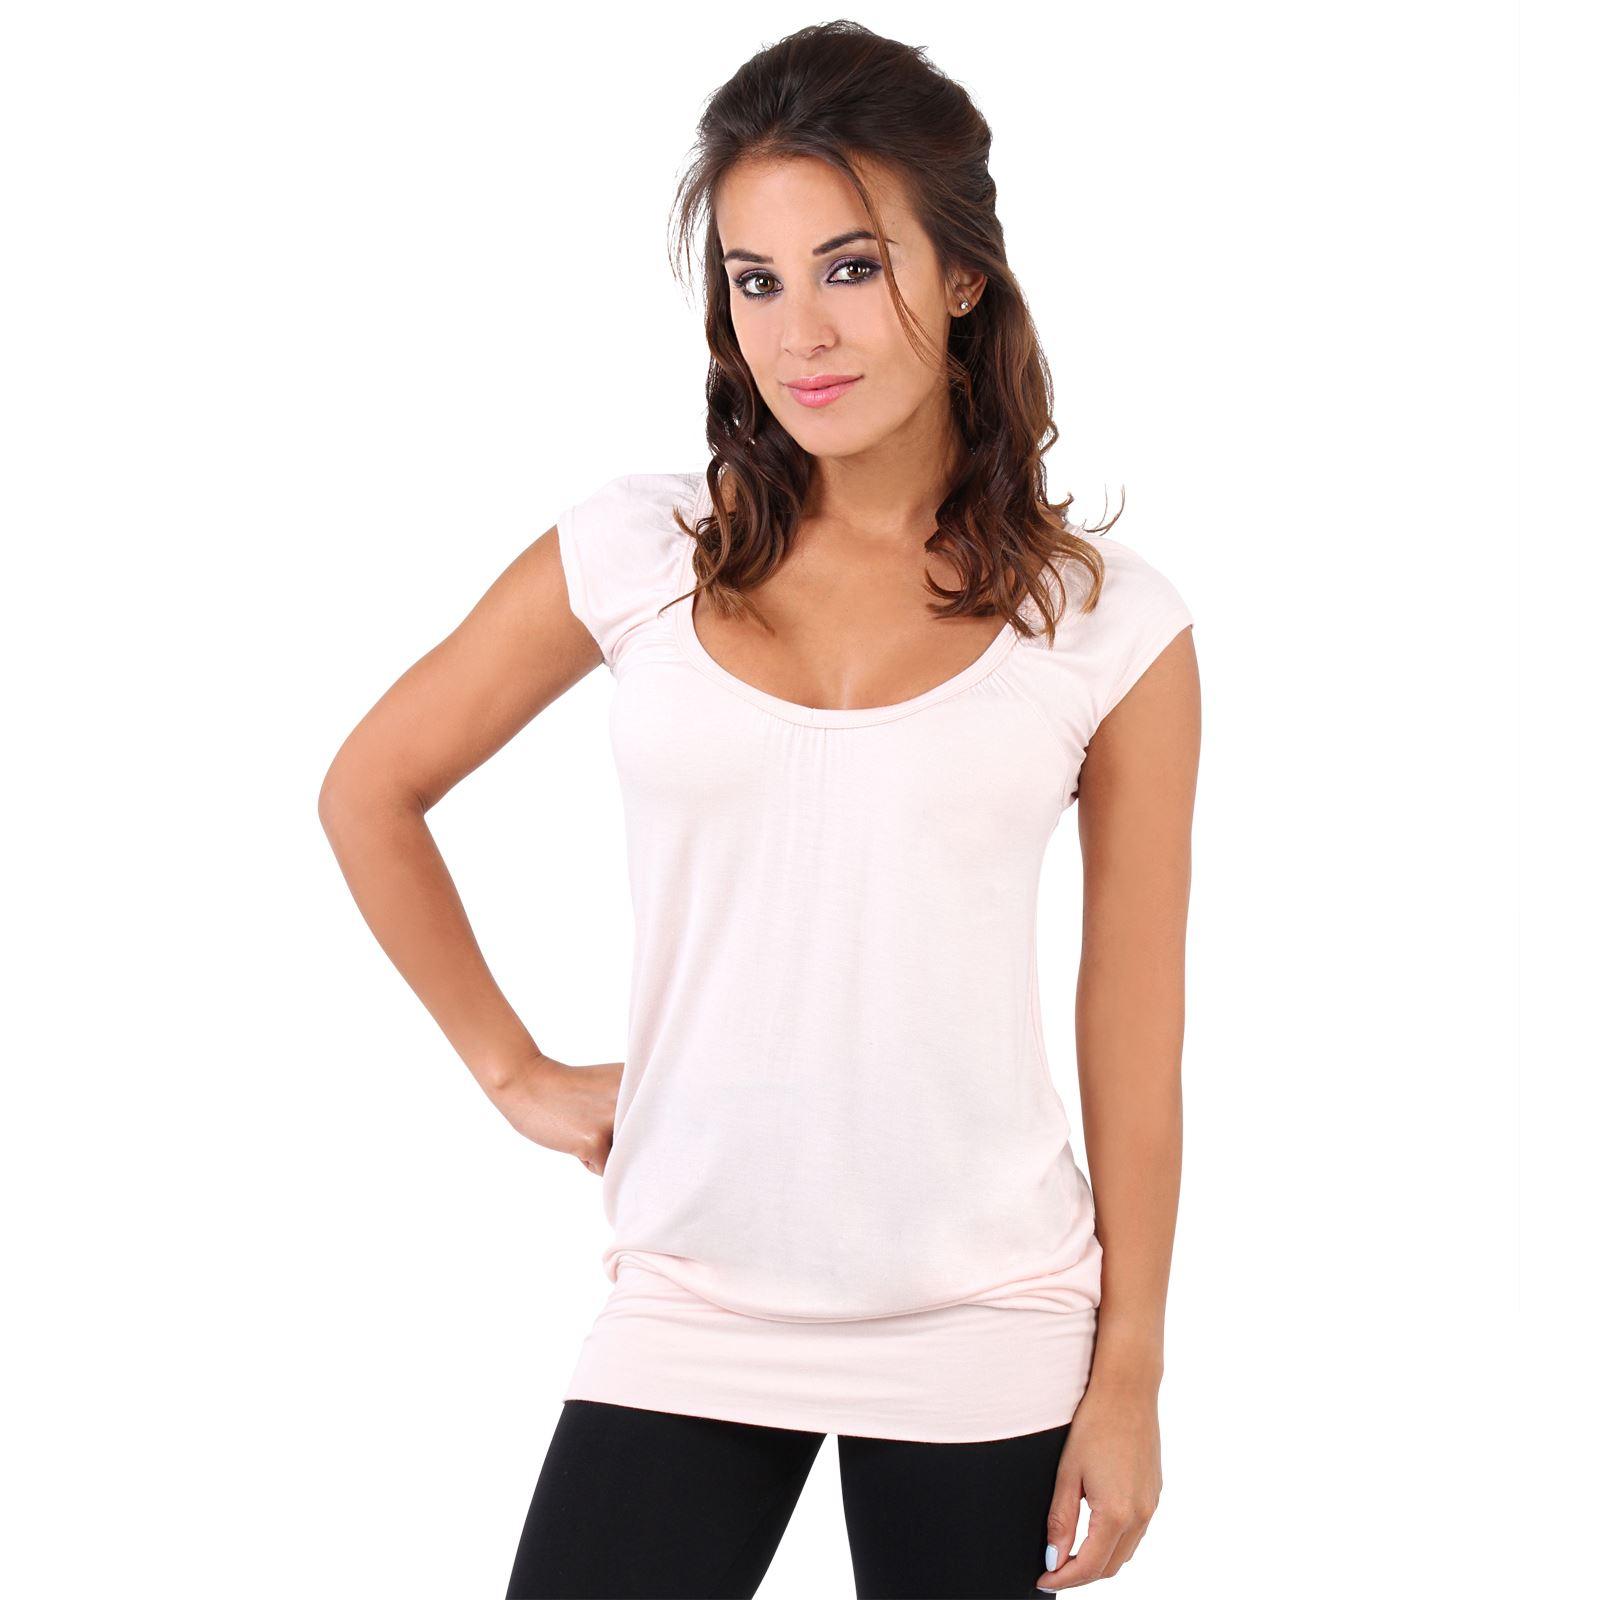 Womens-Ladies-Plain-T-Shirt-Short-Sleeve-Long-Loose-V-Neck-Blouse-Tunic-Top thumbnail 39